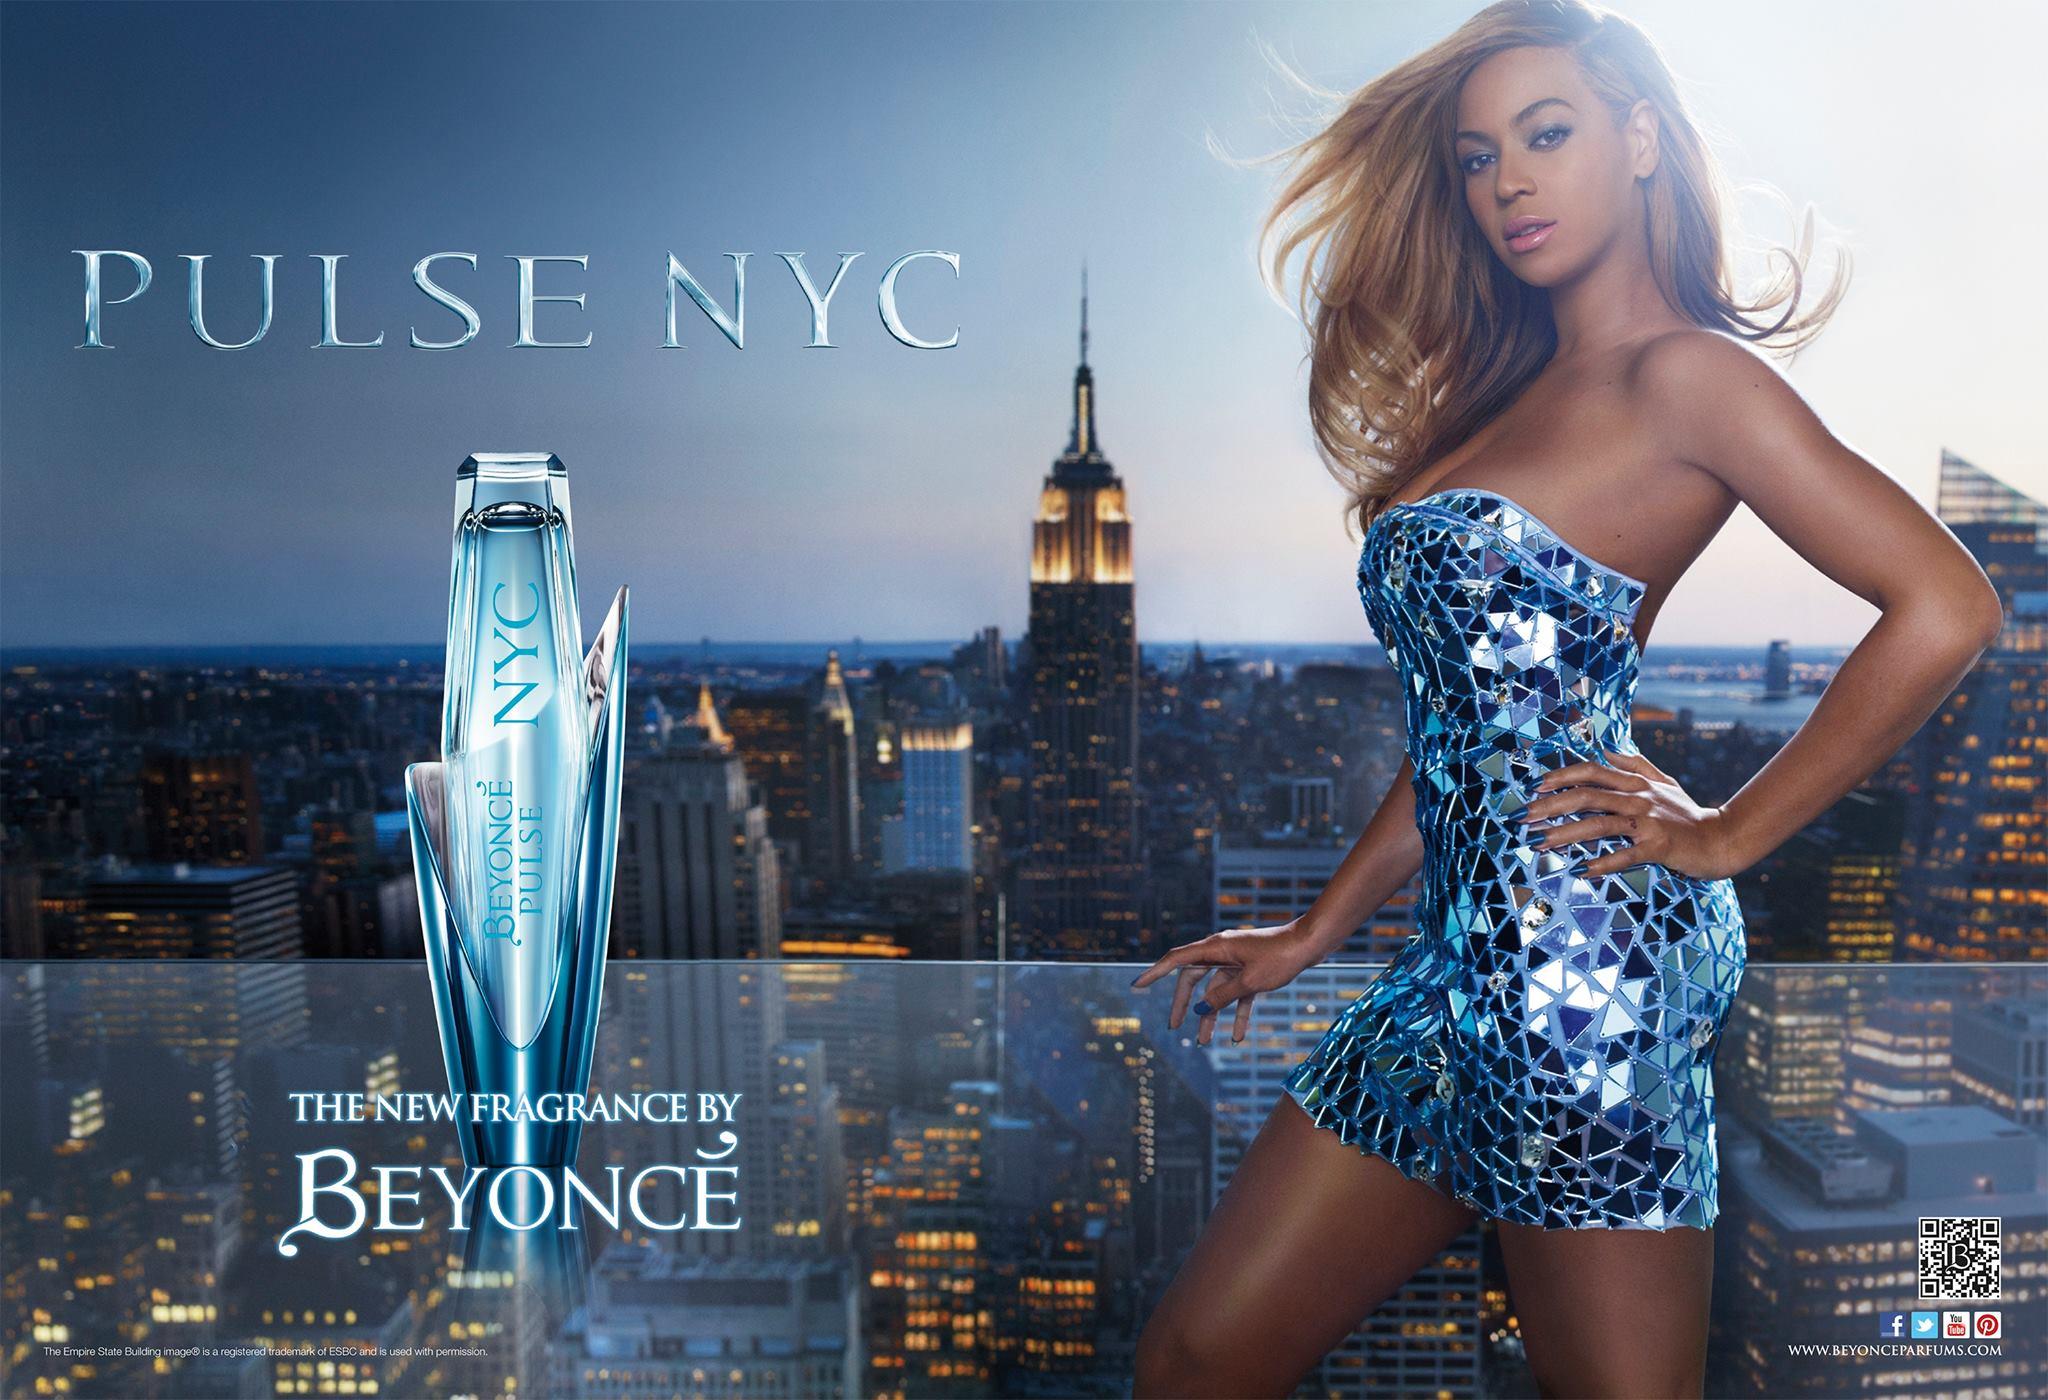 Beyonce's Pulse NYC ad 2012